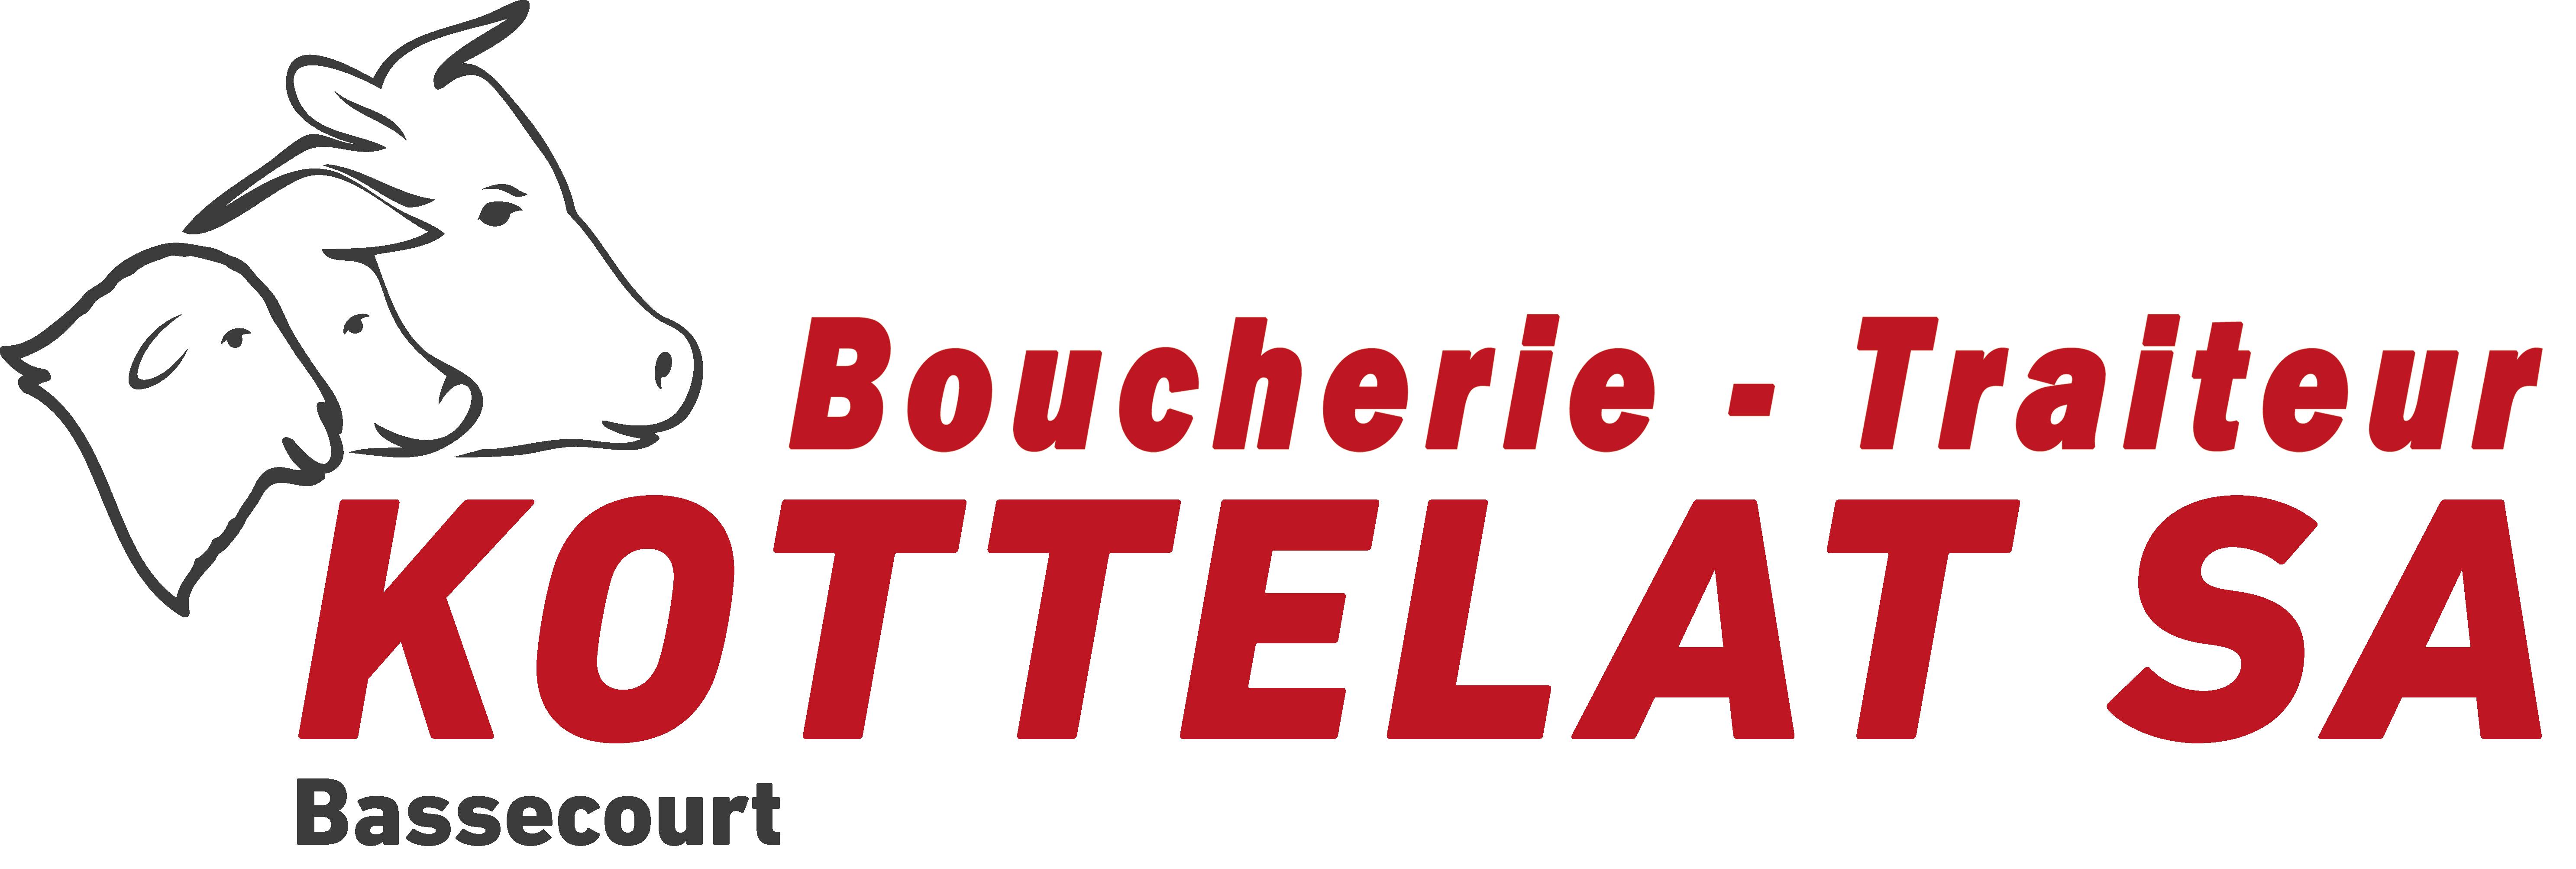 Boucherie-Traiteur Kottelat SA